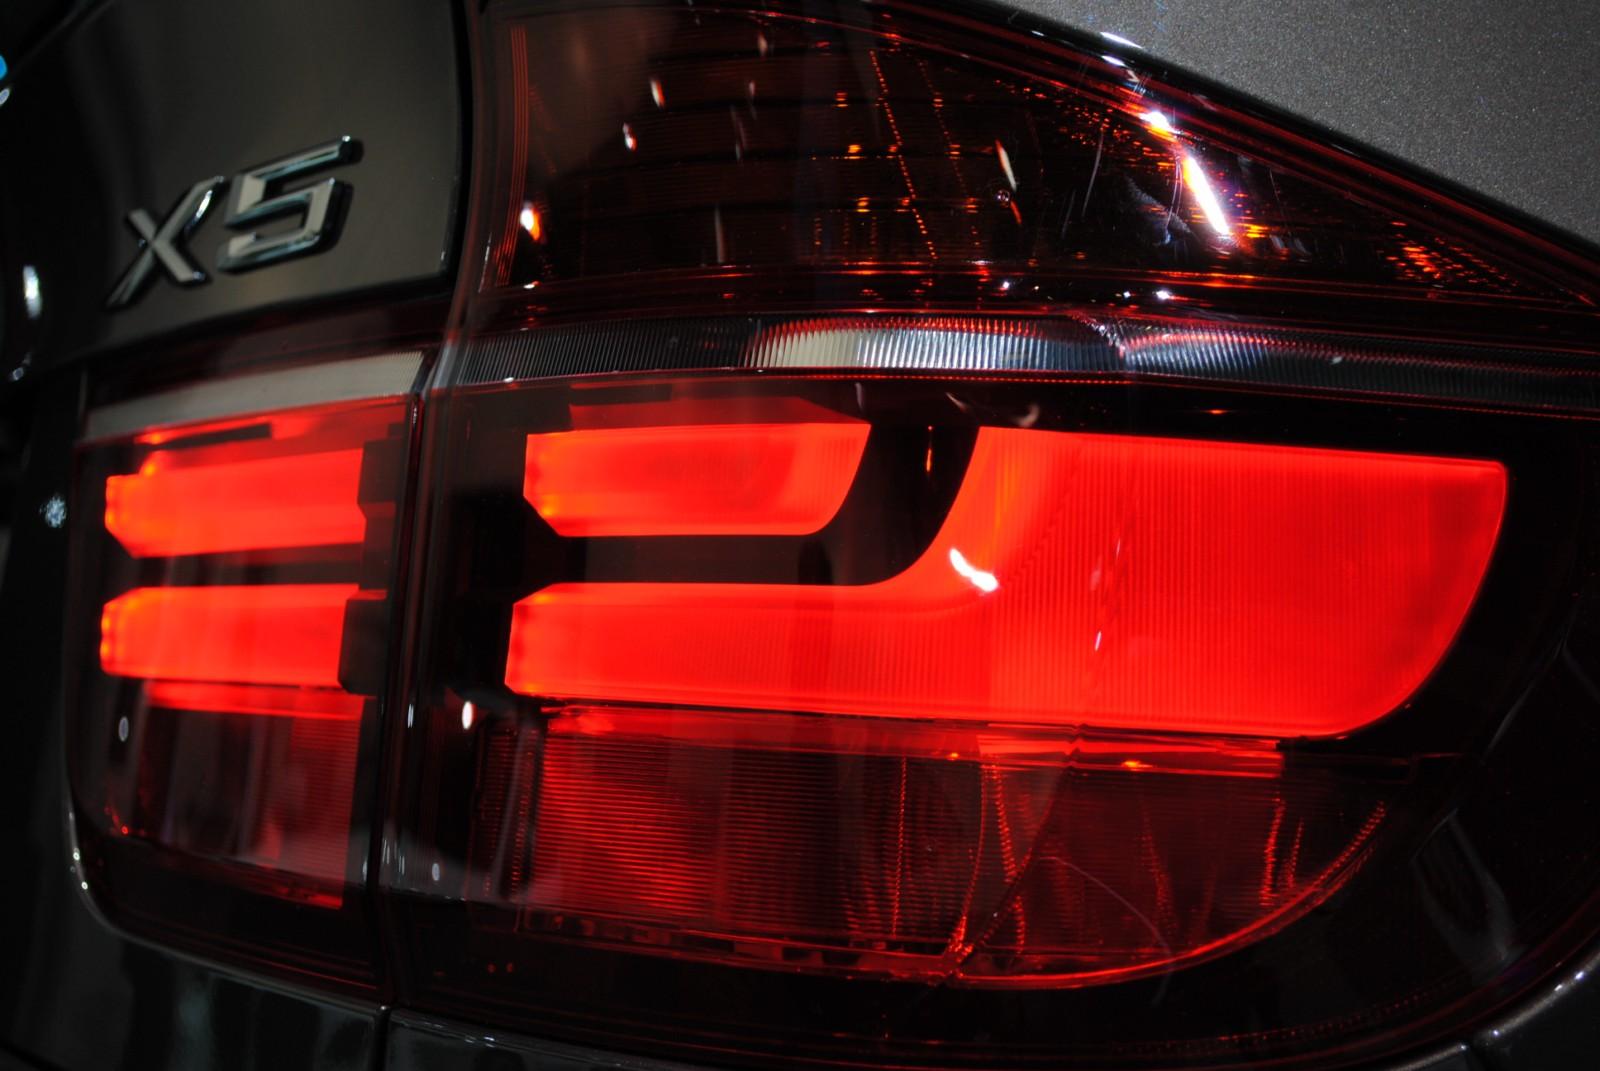 Переделка задних американских фонарей на BMW X5 E70